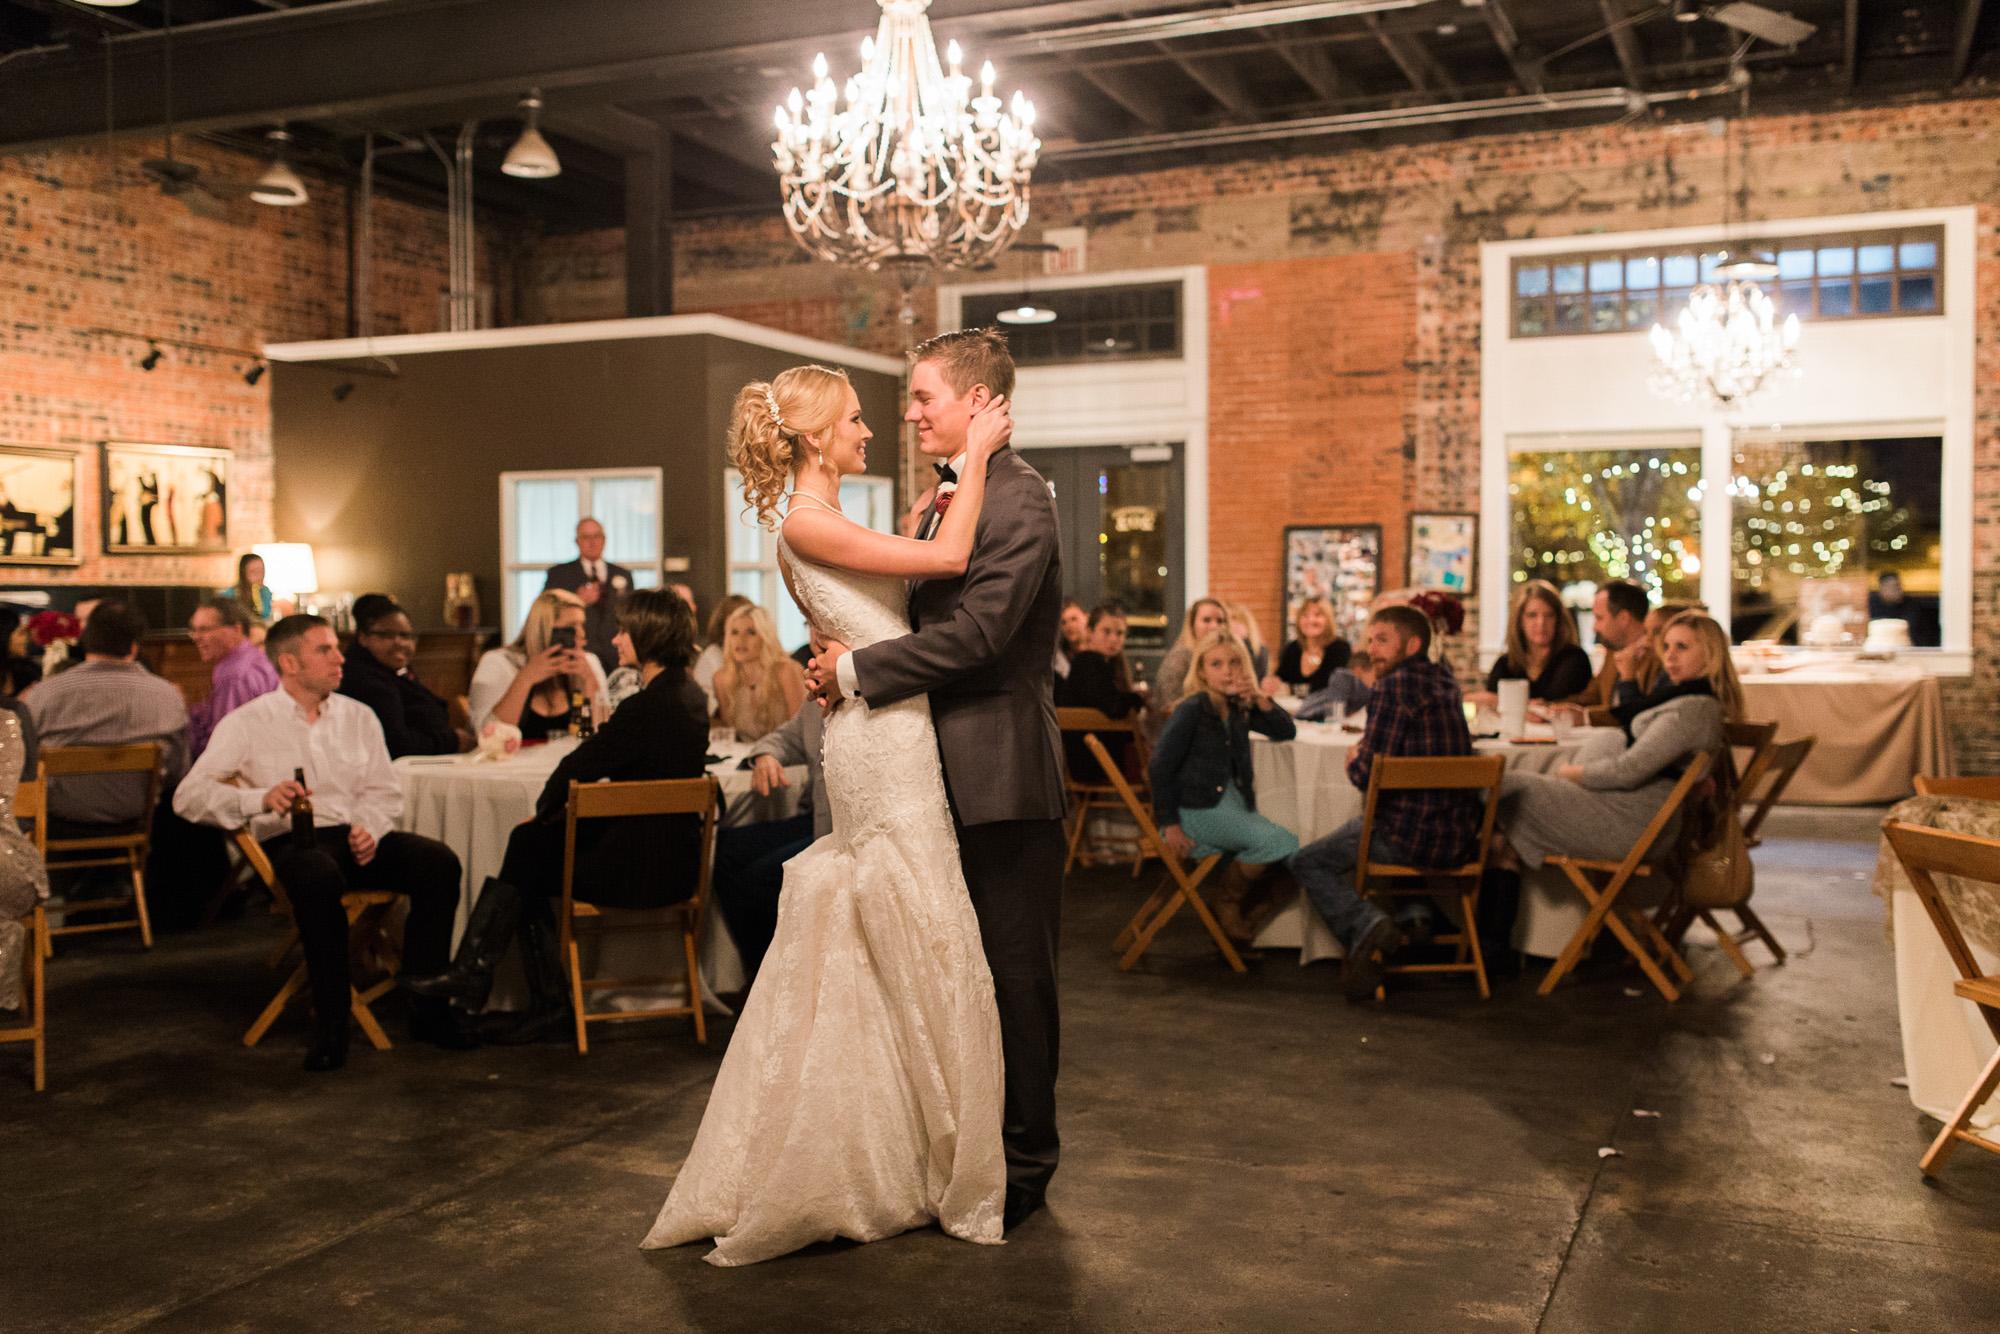 96967-downtown-bryan-weddingdowntown-bryan-wedding.jpg